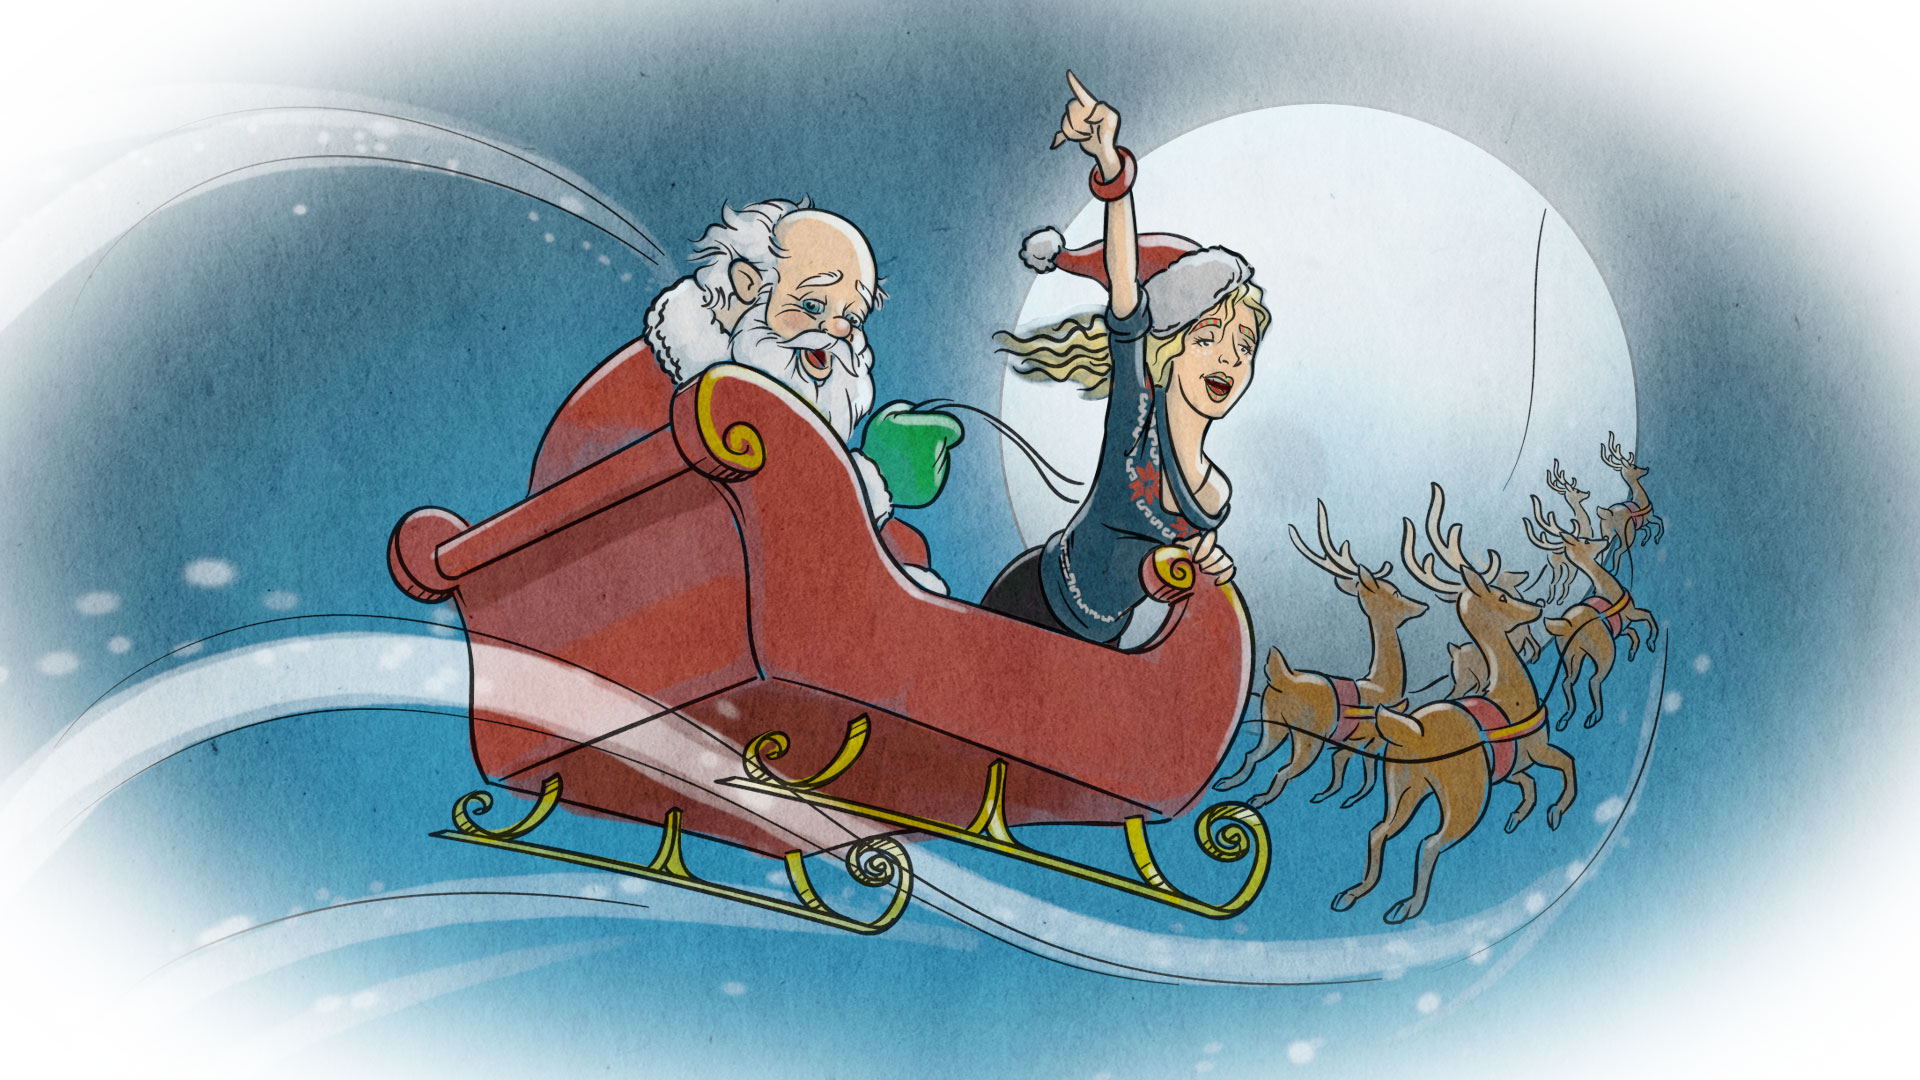 sleigh  merry  kesha HD Wallpaper